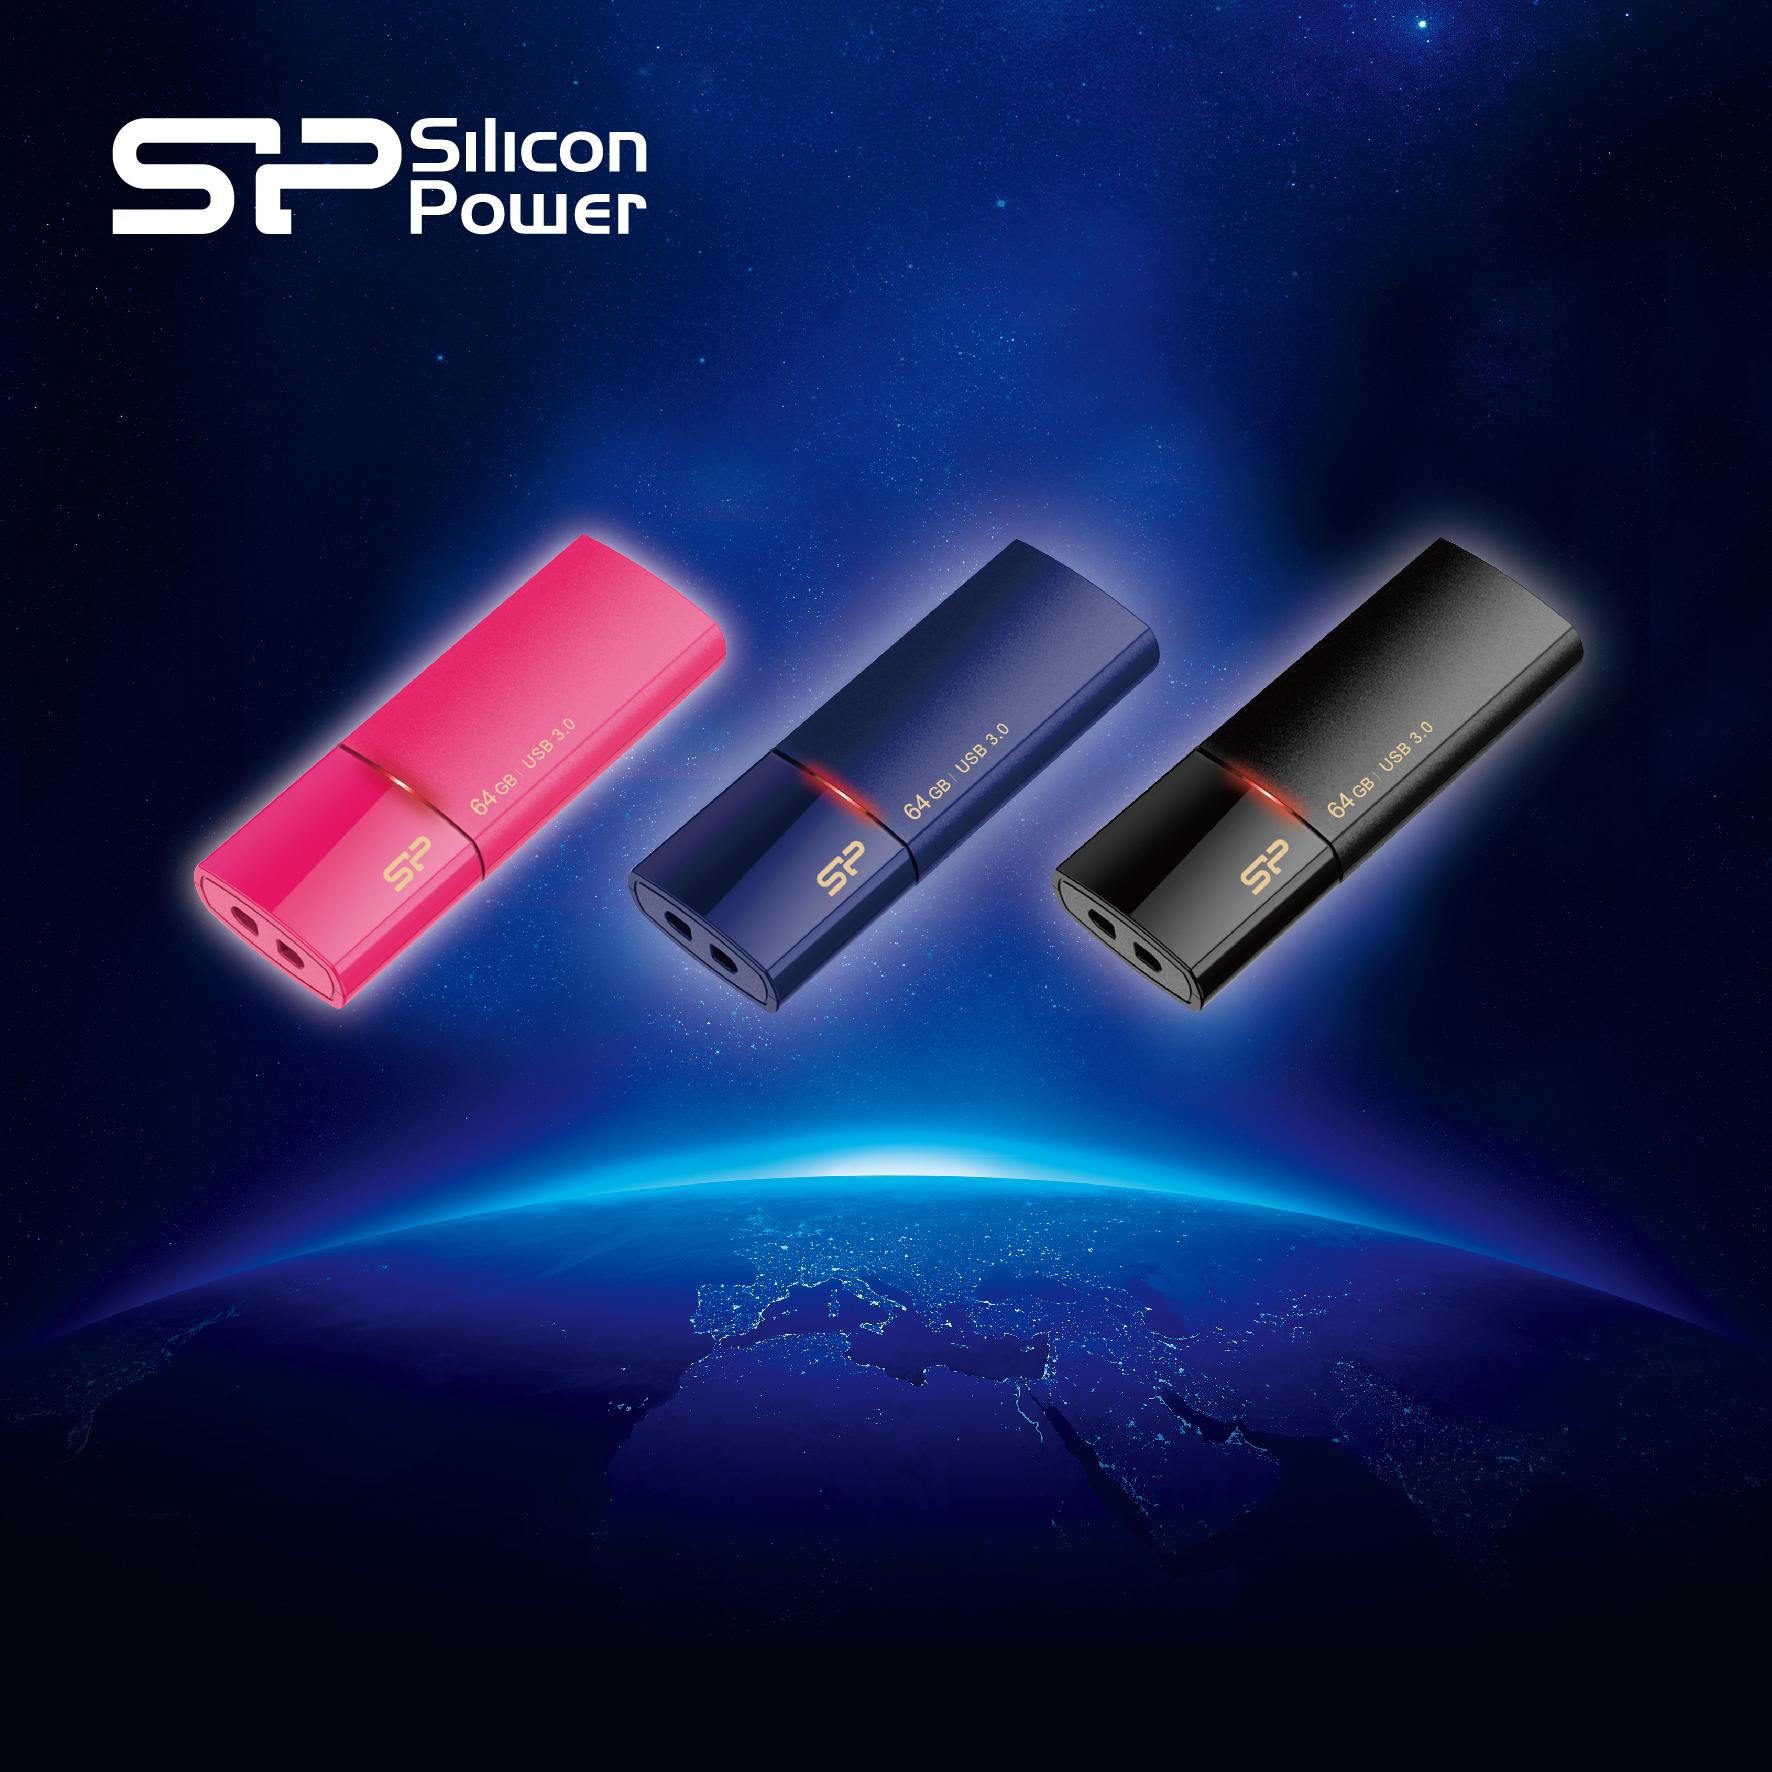 SP廣穎電通 USB 2.0 Ultima U05 & USB 3.0 Blaze B05隨身碟 -指尖輕科技 繽紛靚時尚